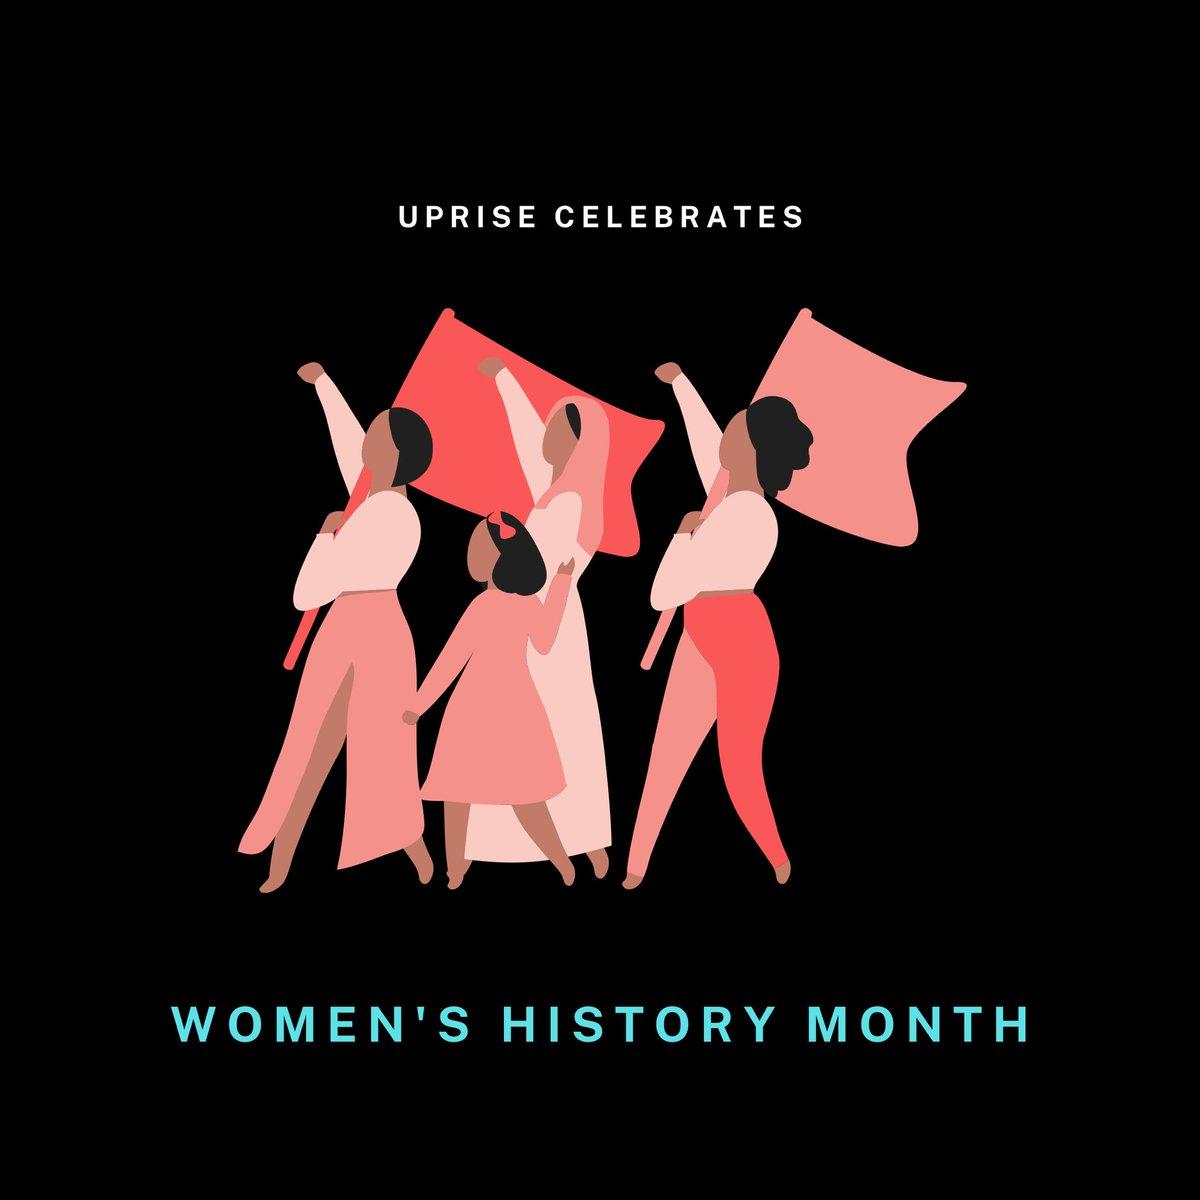 ¡Que Viva La Mujer! #WomensHistoryMonth